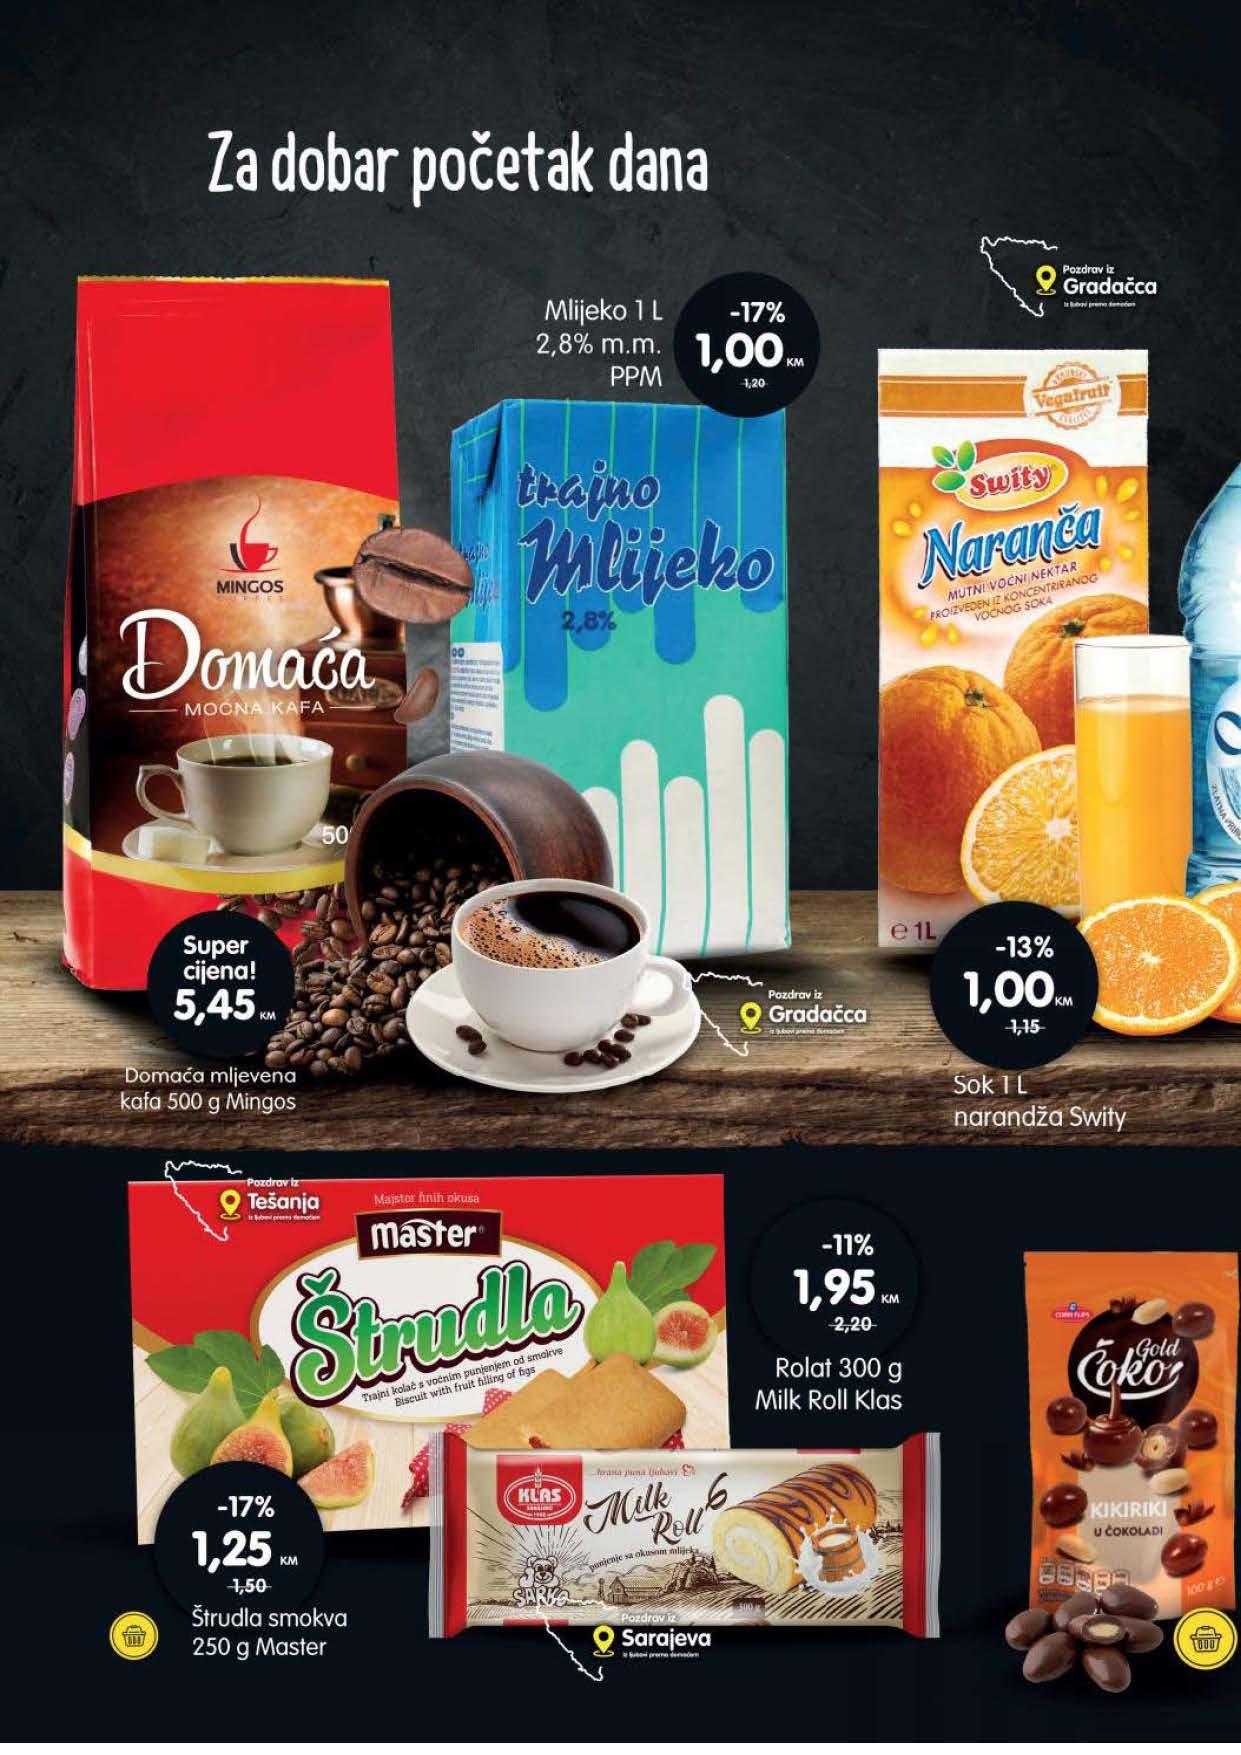 BINGO Katalog Kupuj pametno kupuj domace JUN JUL 2021 28.6.2021. 4.7.2021. Page 6